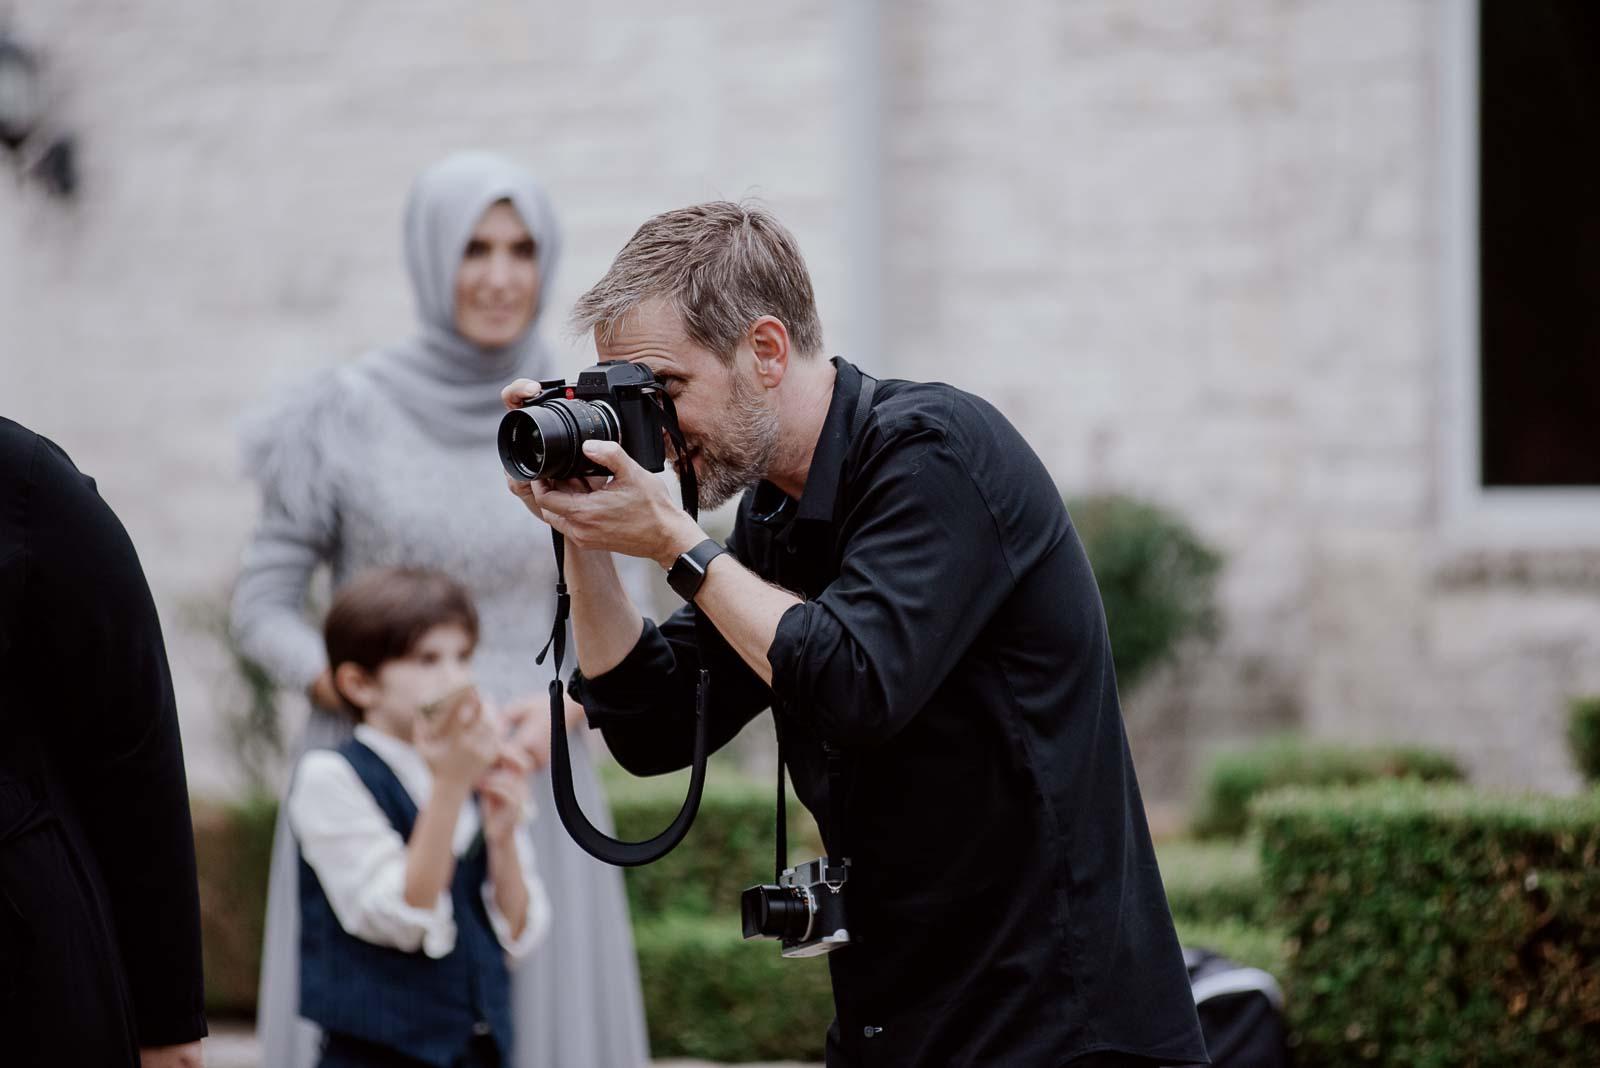 Philip Thomas, wedding photographer, making images on location at Briscoe Manor, Texas